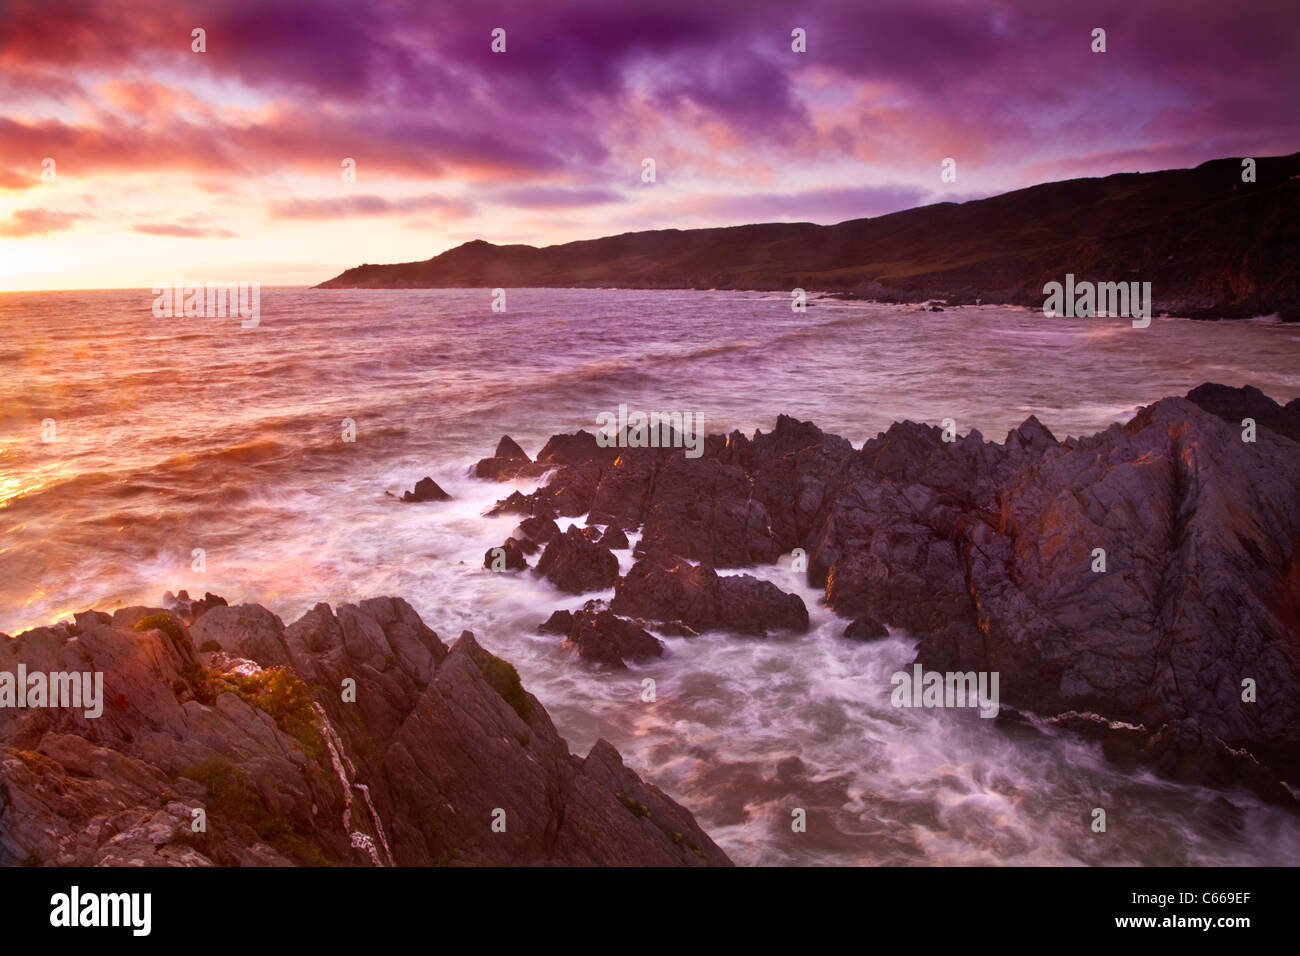 Sonnenuntergang über den Bristolkanal vom Barricane Strand, Woolacombe, Blick in Richtung Morte Point, North Stockbild